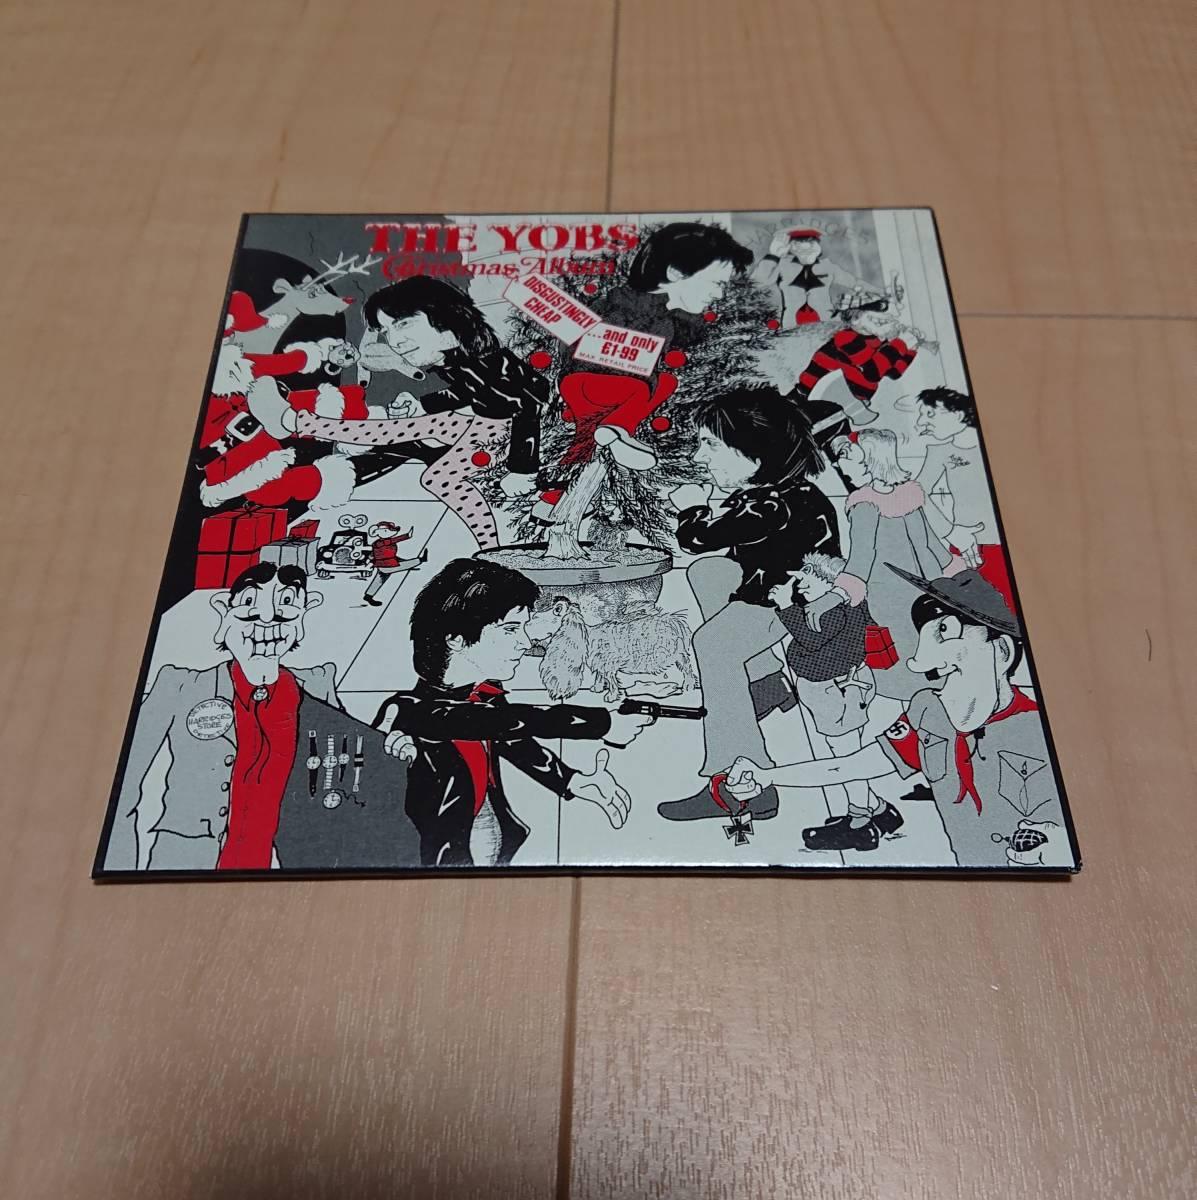 【The Yobs - The Yobs Christmas Album】boys dickies circles power pop